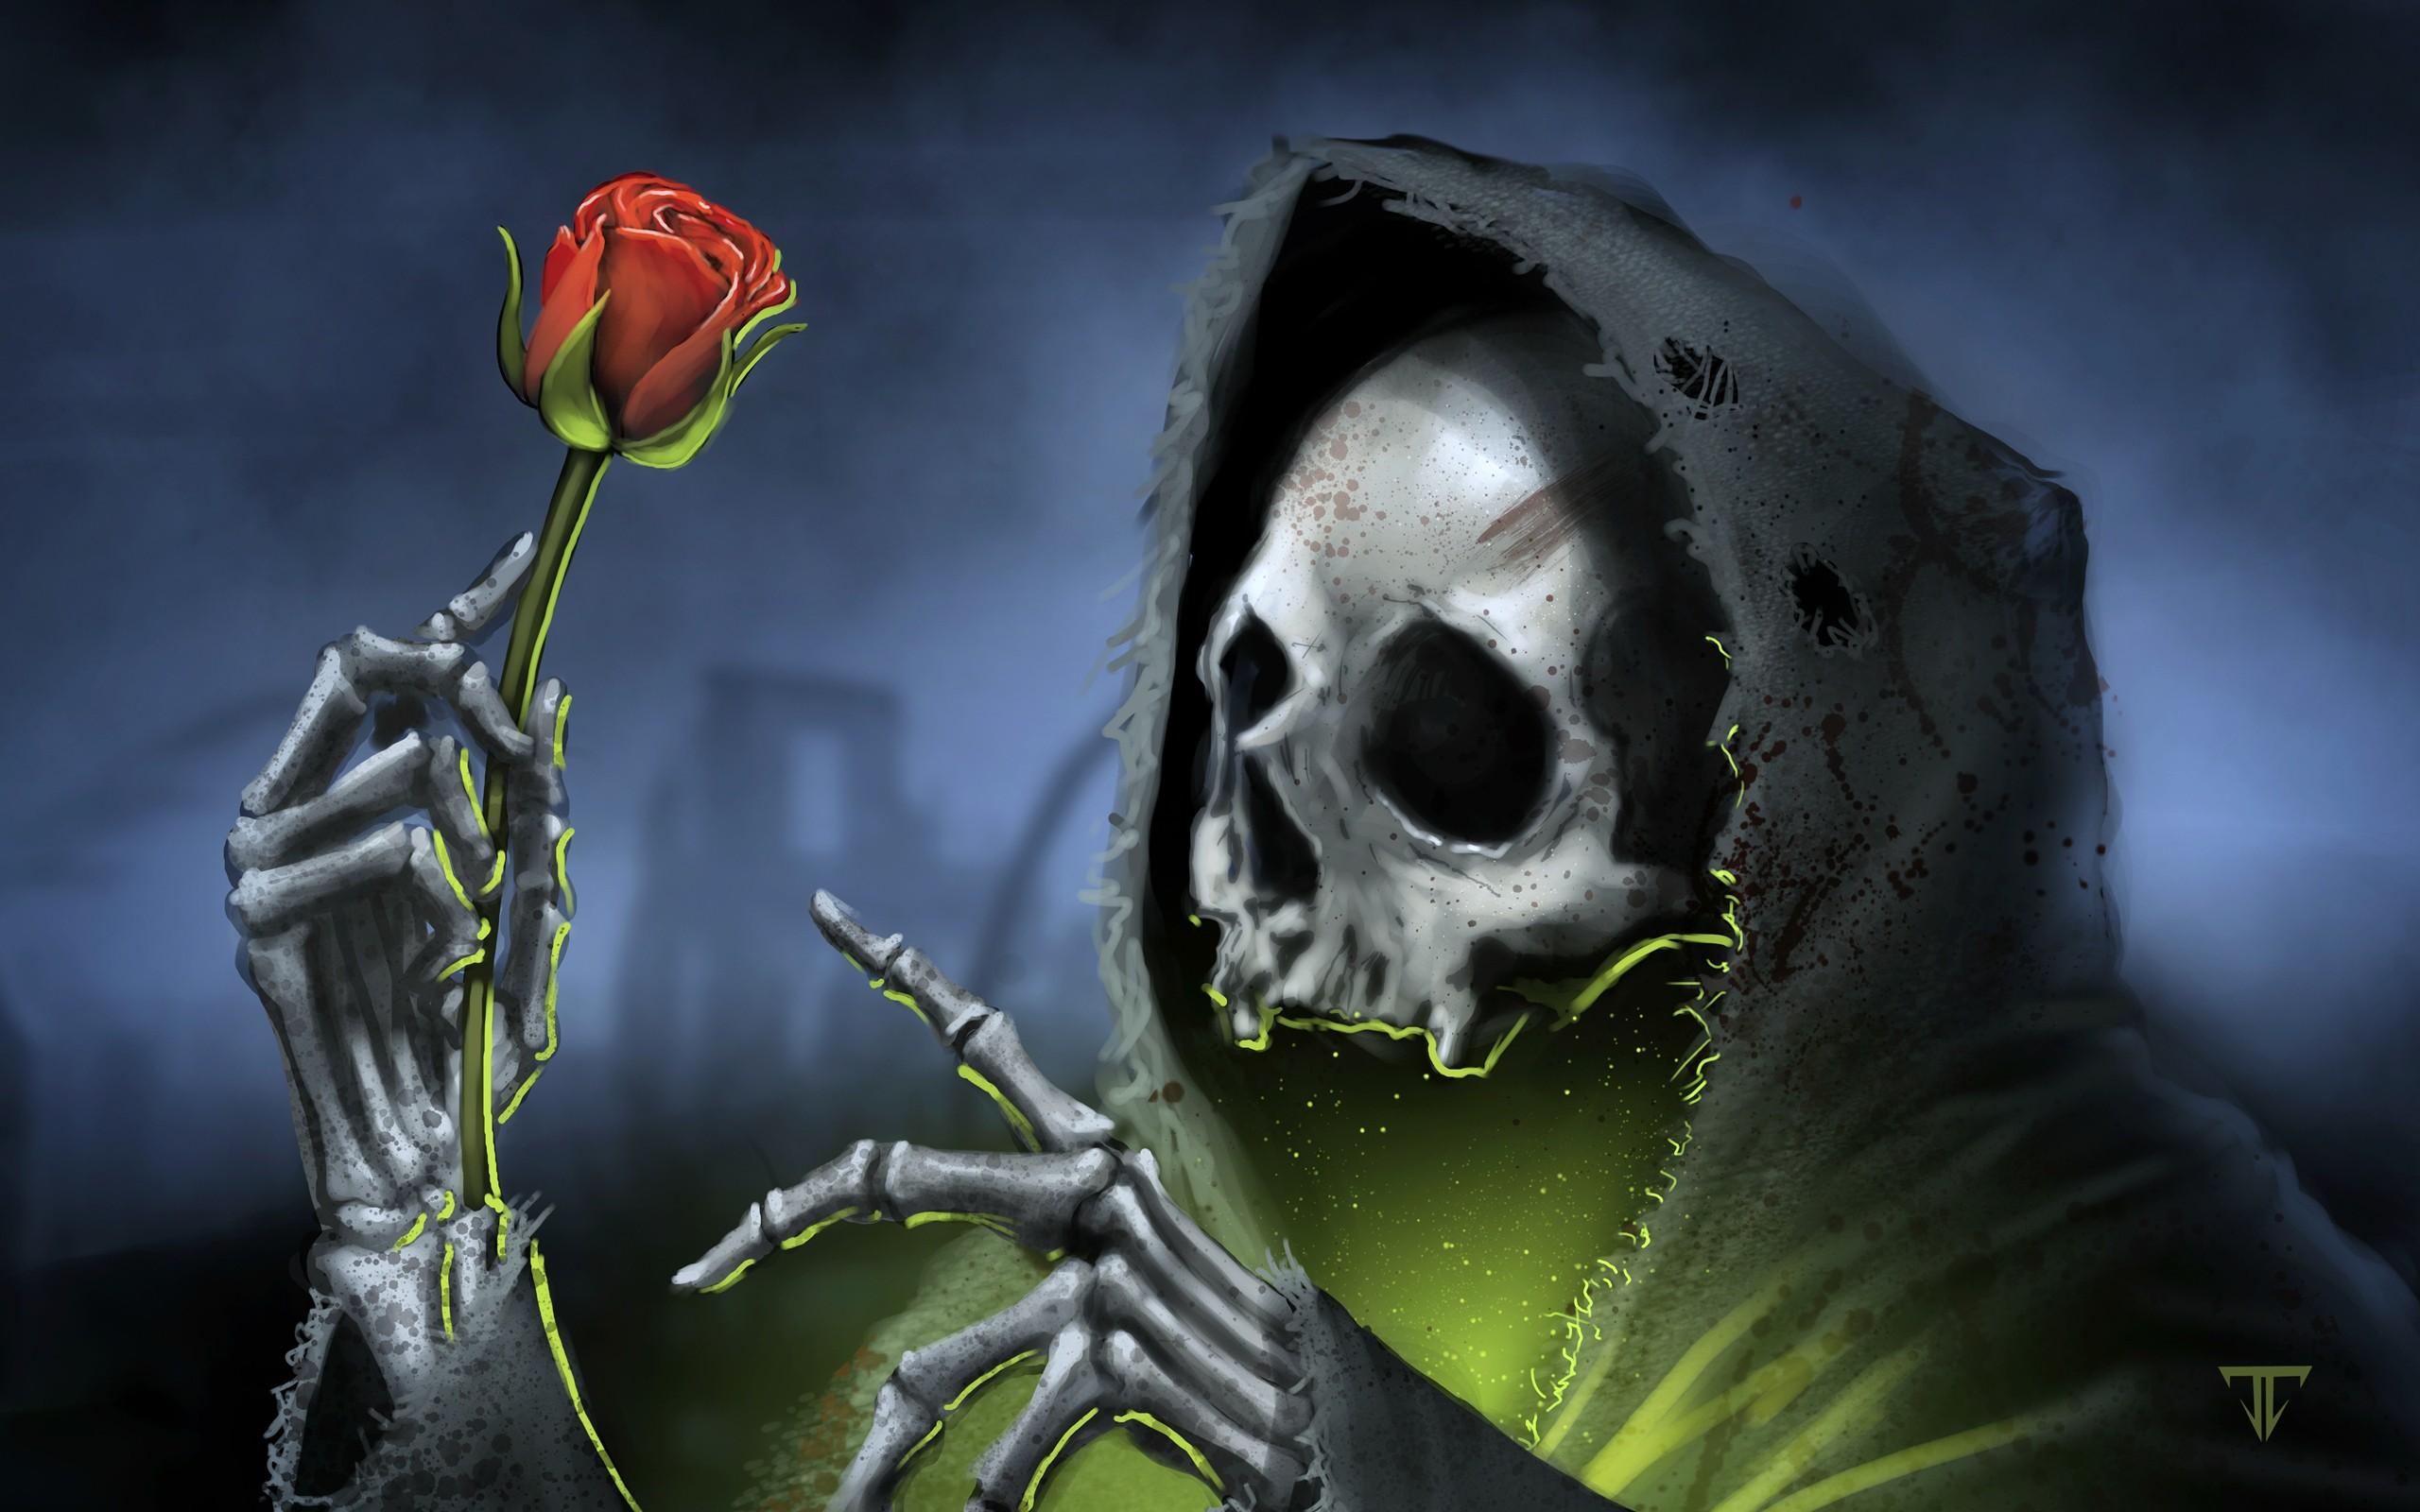 2880x1800 Black Rose Wallpaper From Gothic Wallpapers SCARLET Pinterest Source Skulls WallpaperSafari